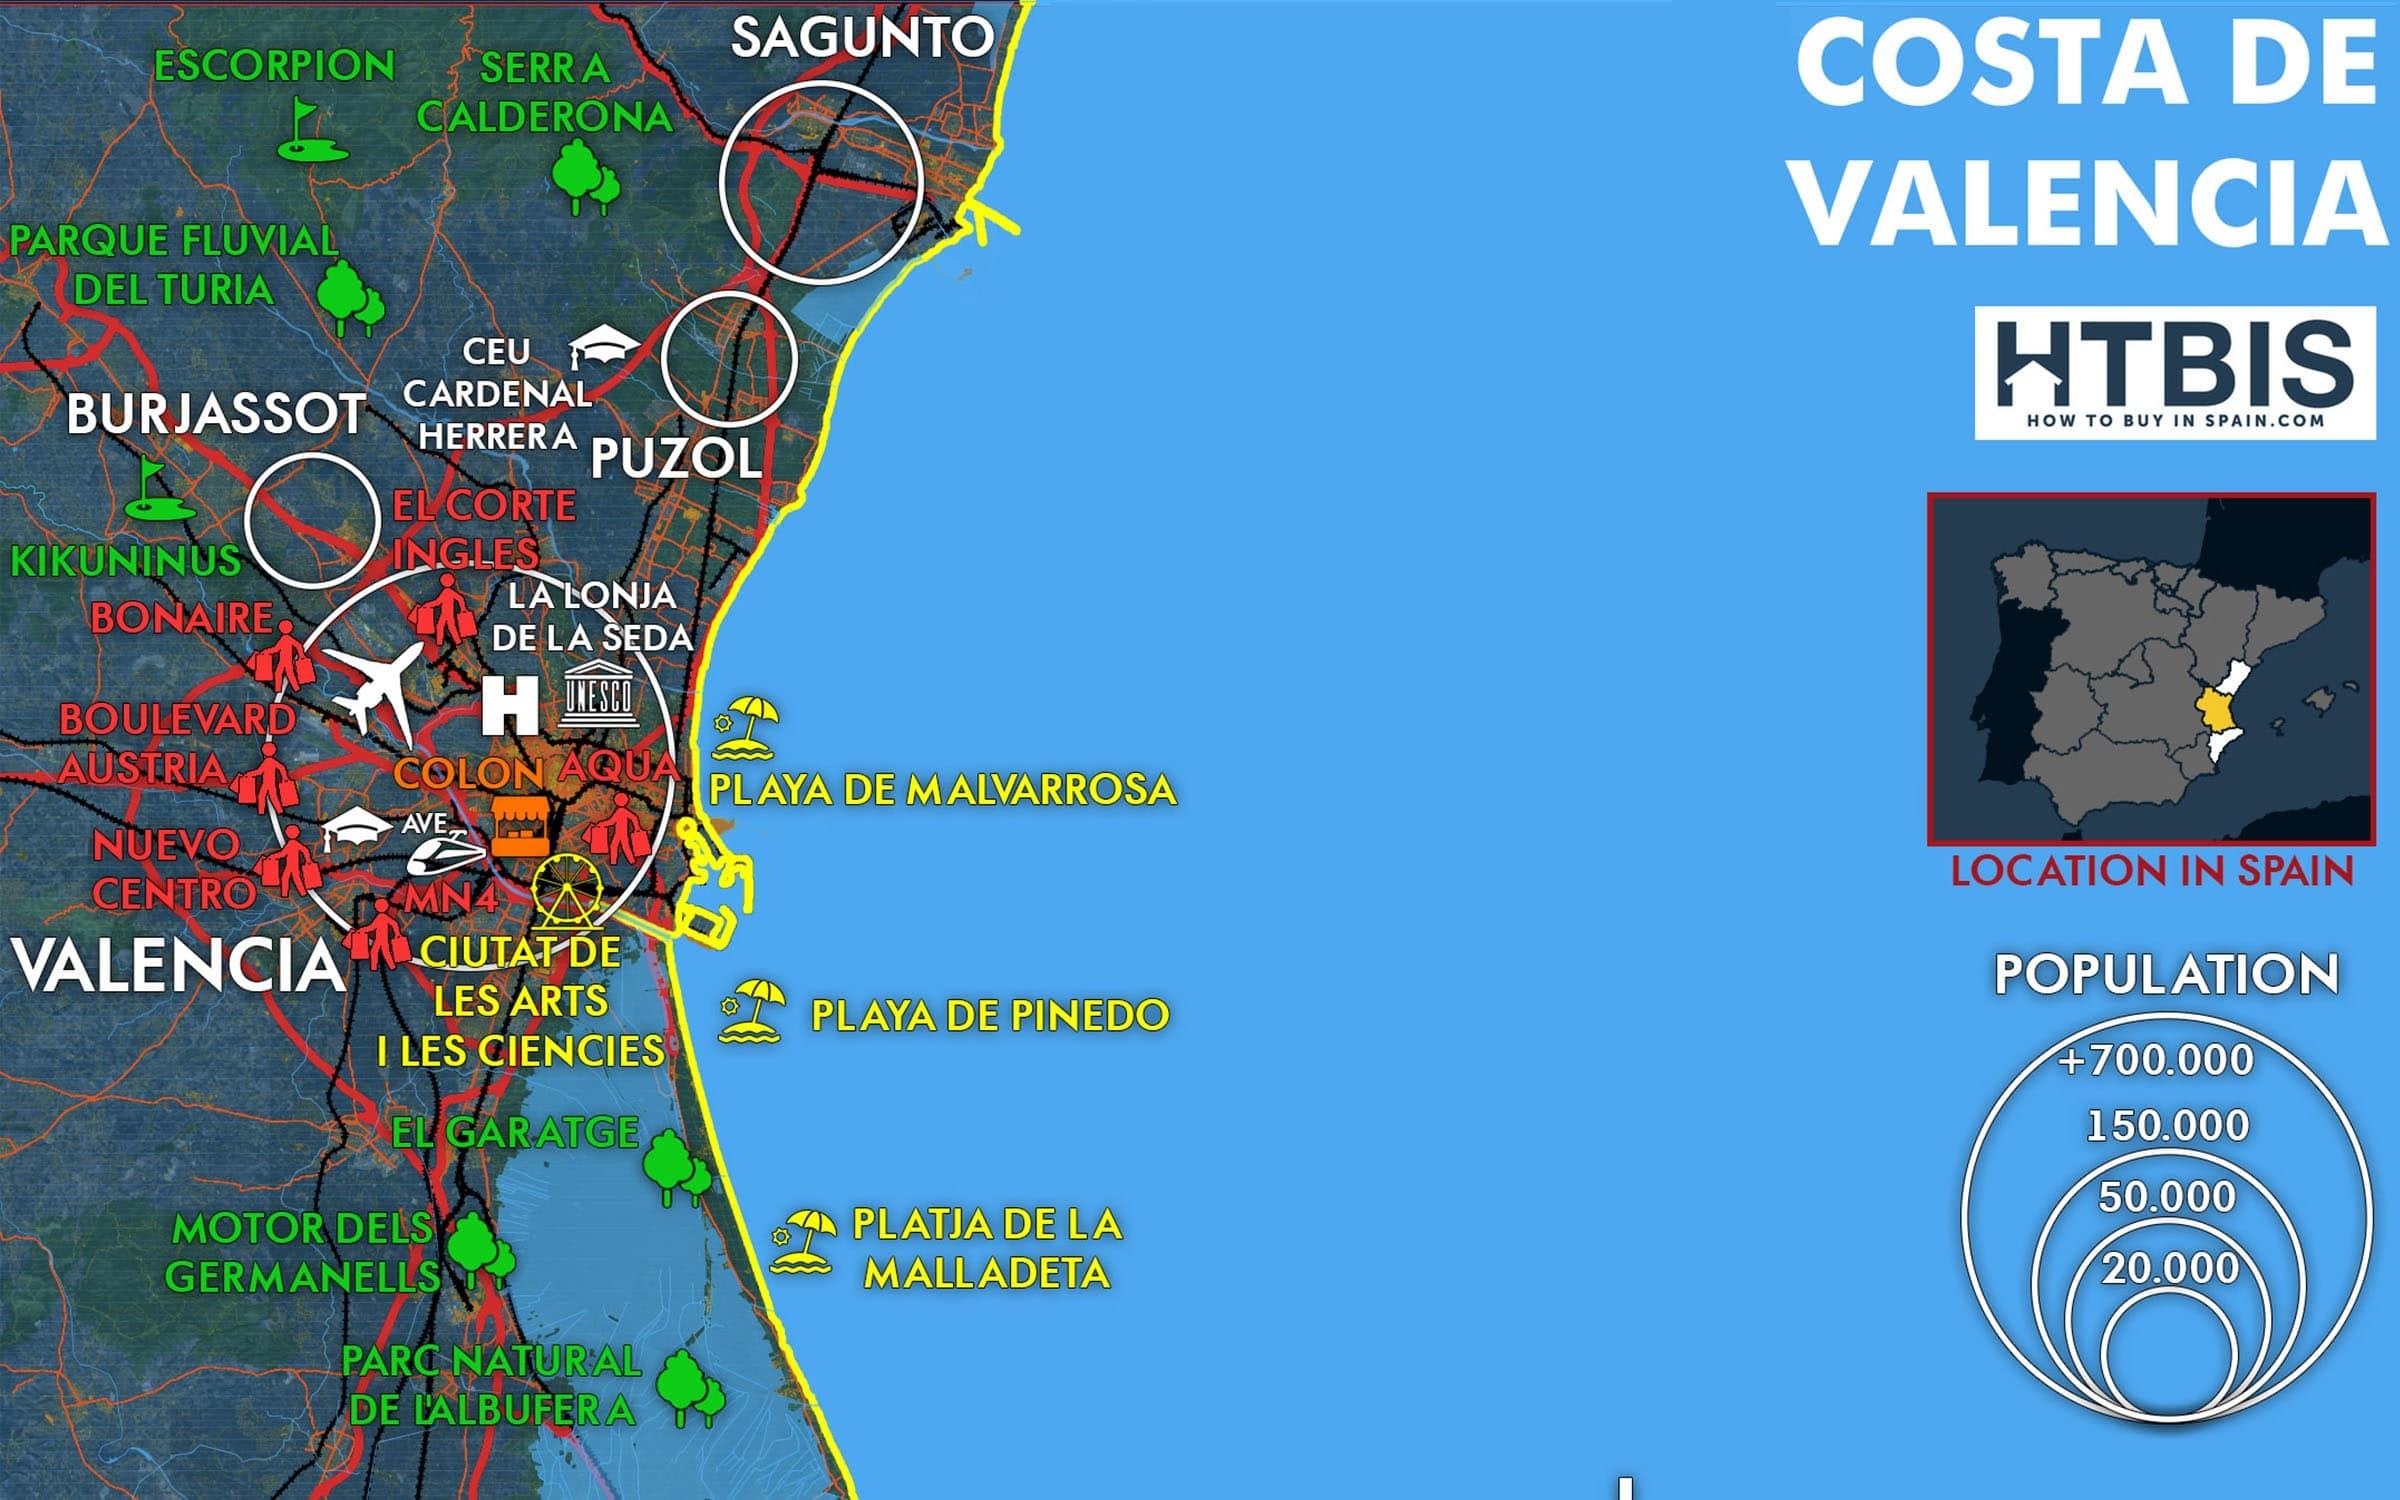 Costa de Valencia must see places map